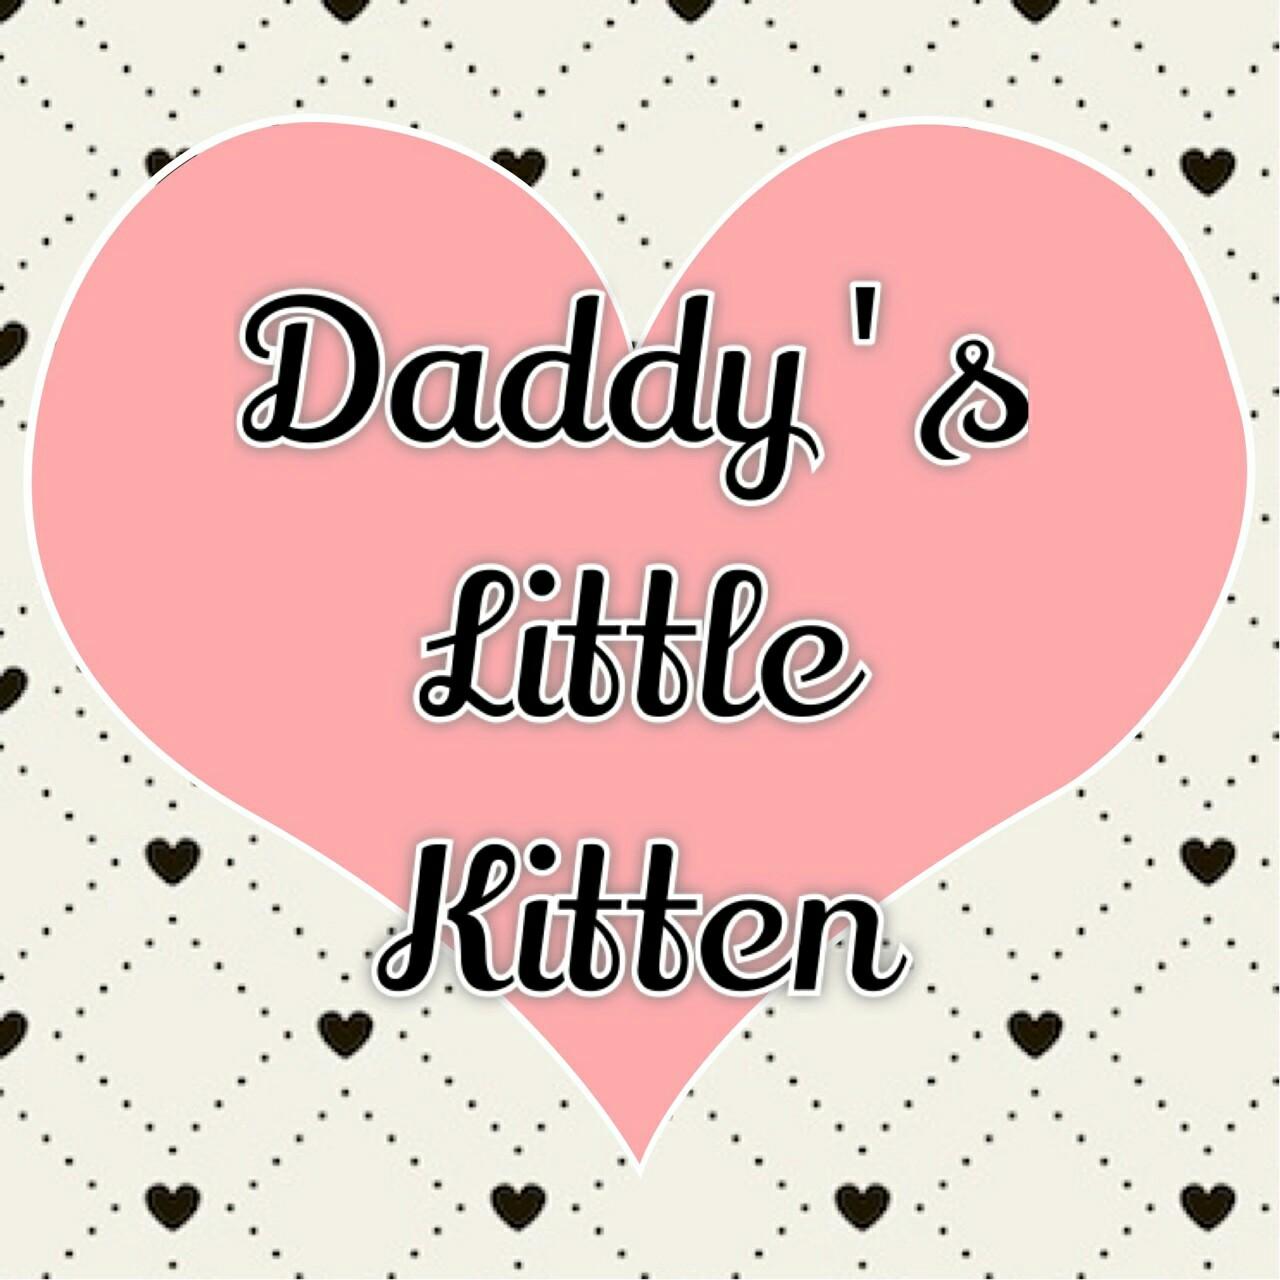 faeacaa-kinky-kitten-daddys-girl-wallpaper-wp5001426